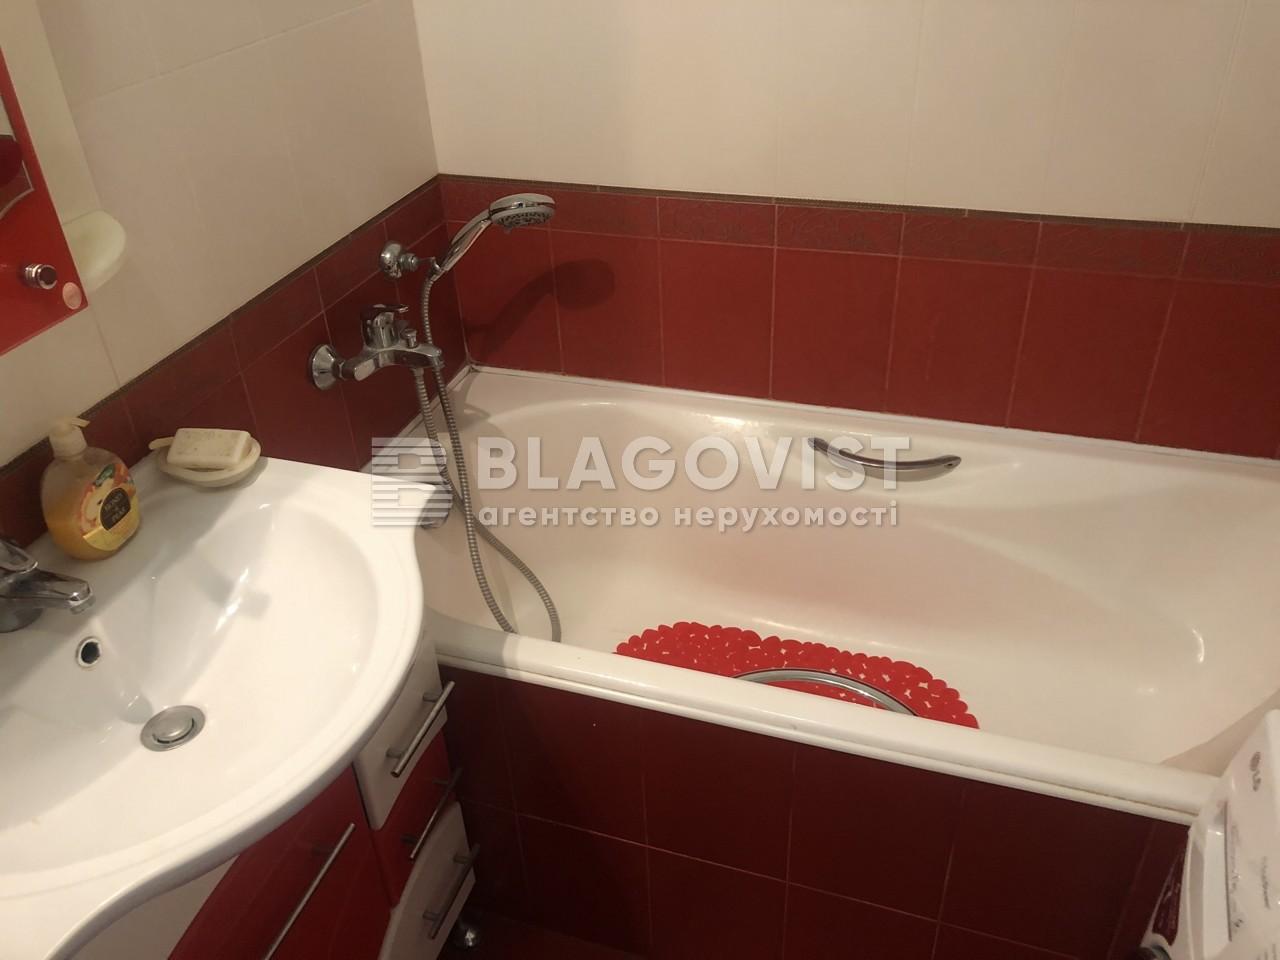 Квартира E-40947, Правды просп., 37а, Киев - Фото 17